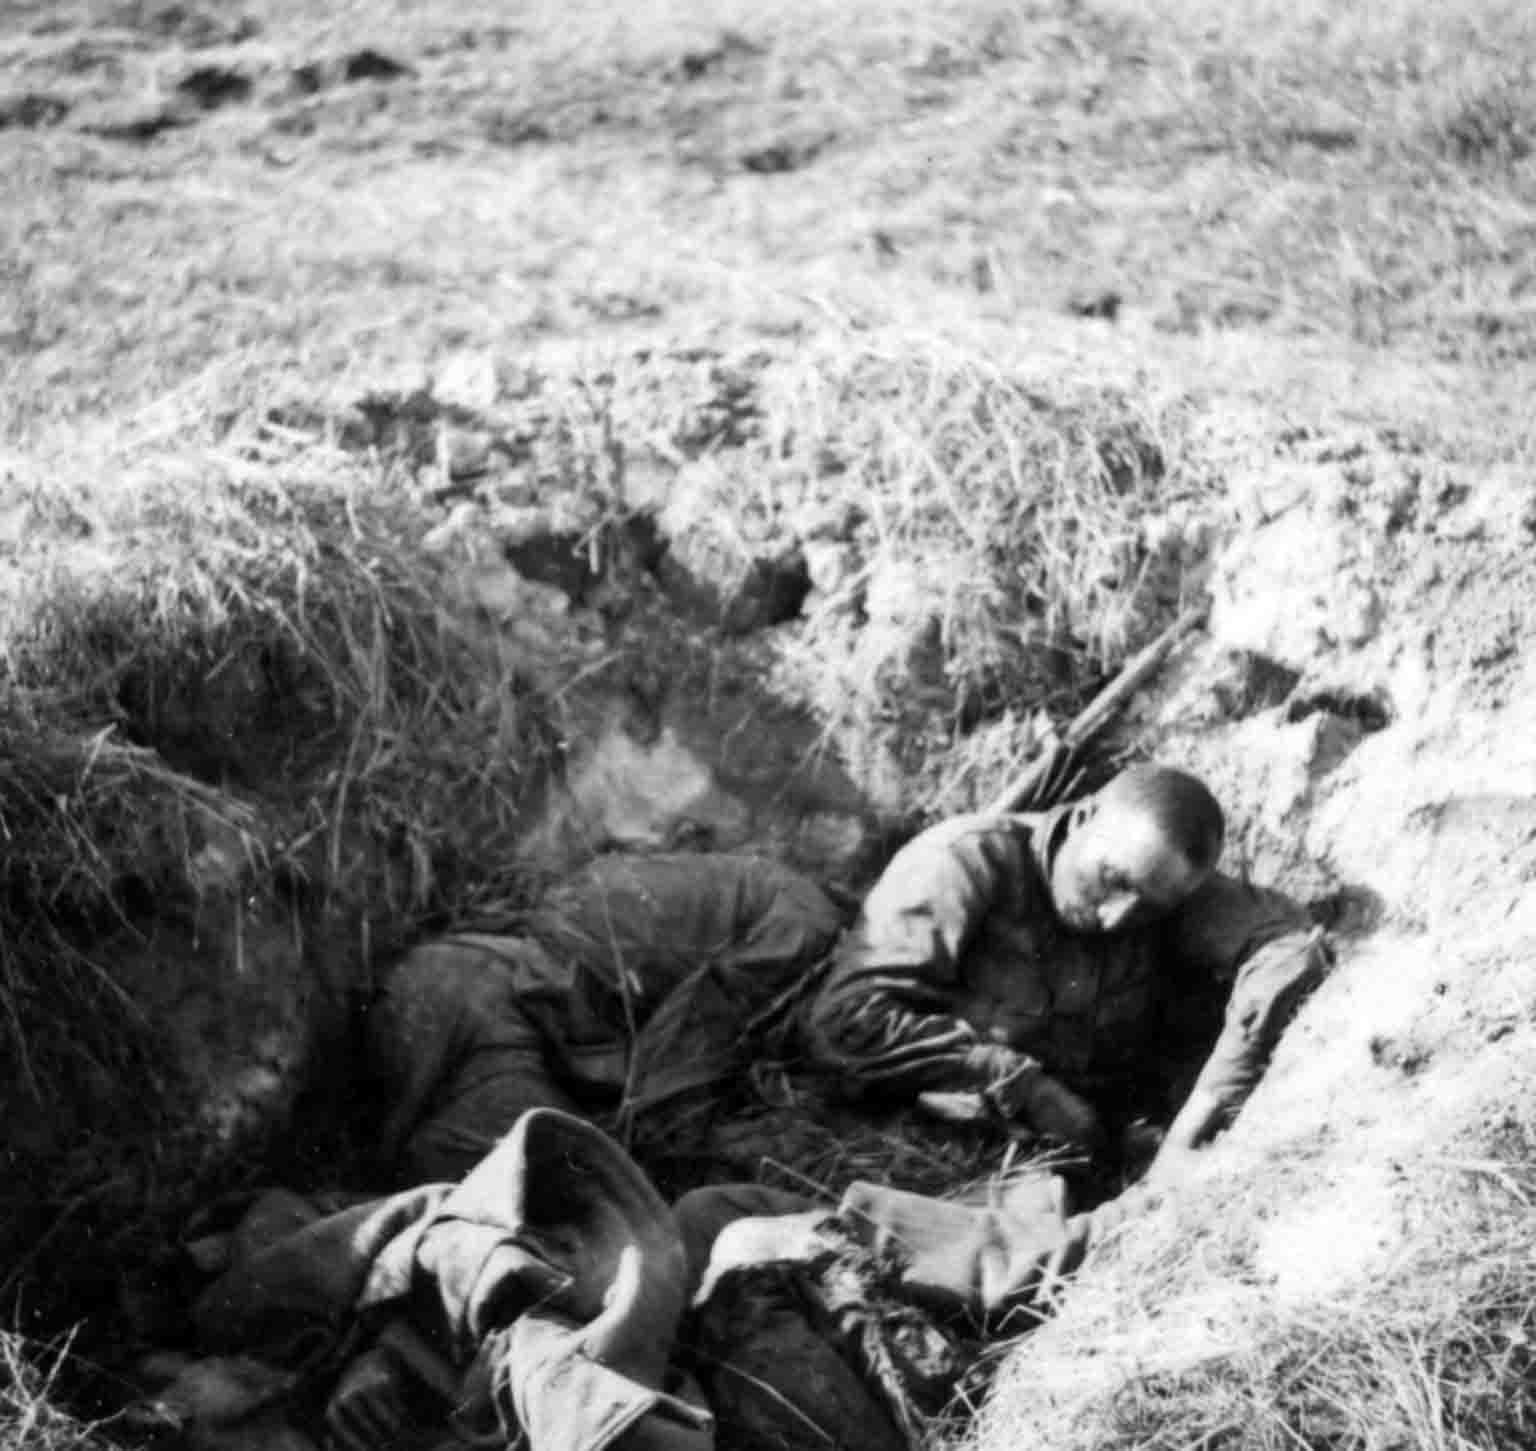 The dead infantrymen